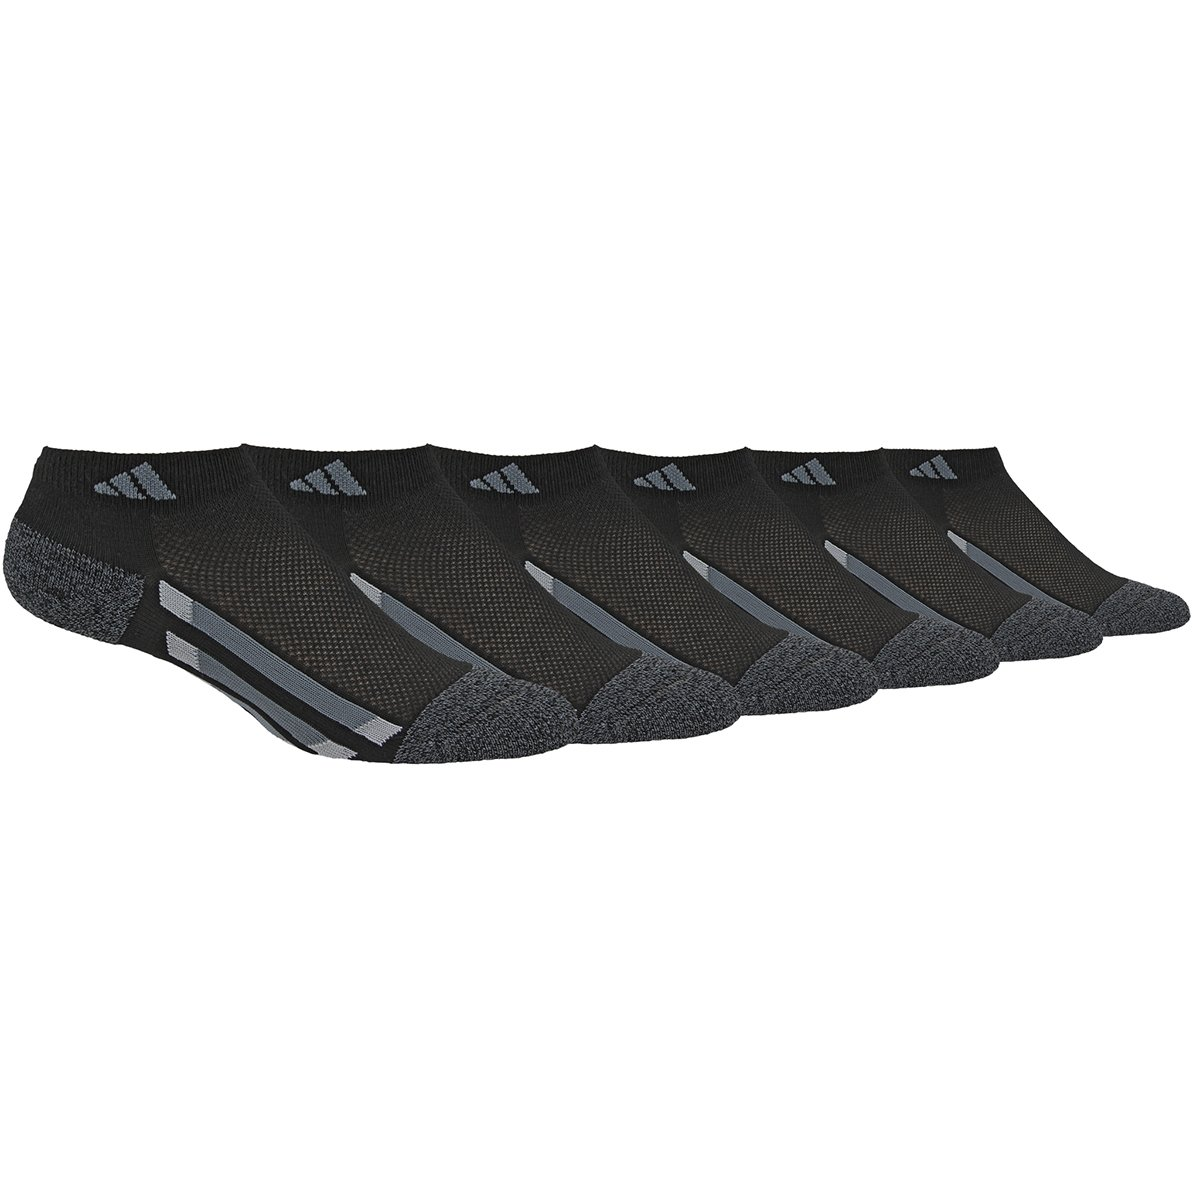 adidas Youth Kids-Boy's/Girl's Cushioned Low Cut Socks (6-Pair), Black/Black - Onix Marl/Light Onix/Onix, Medium, (Shoe Size 13C-4Y) by adidas